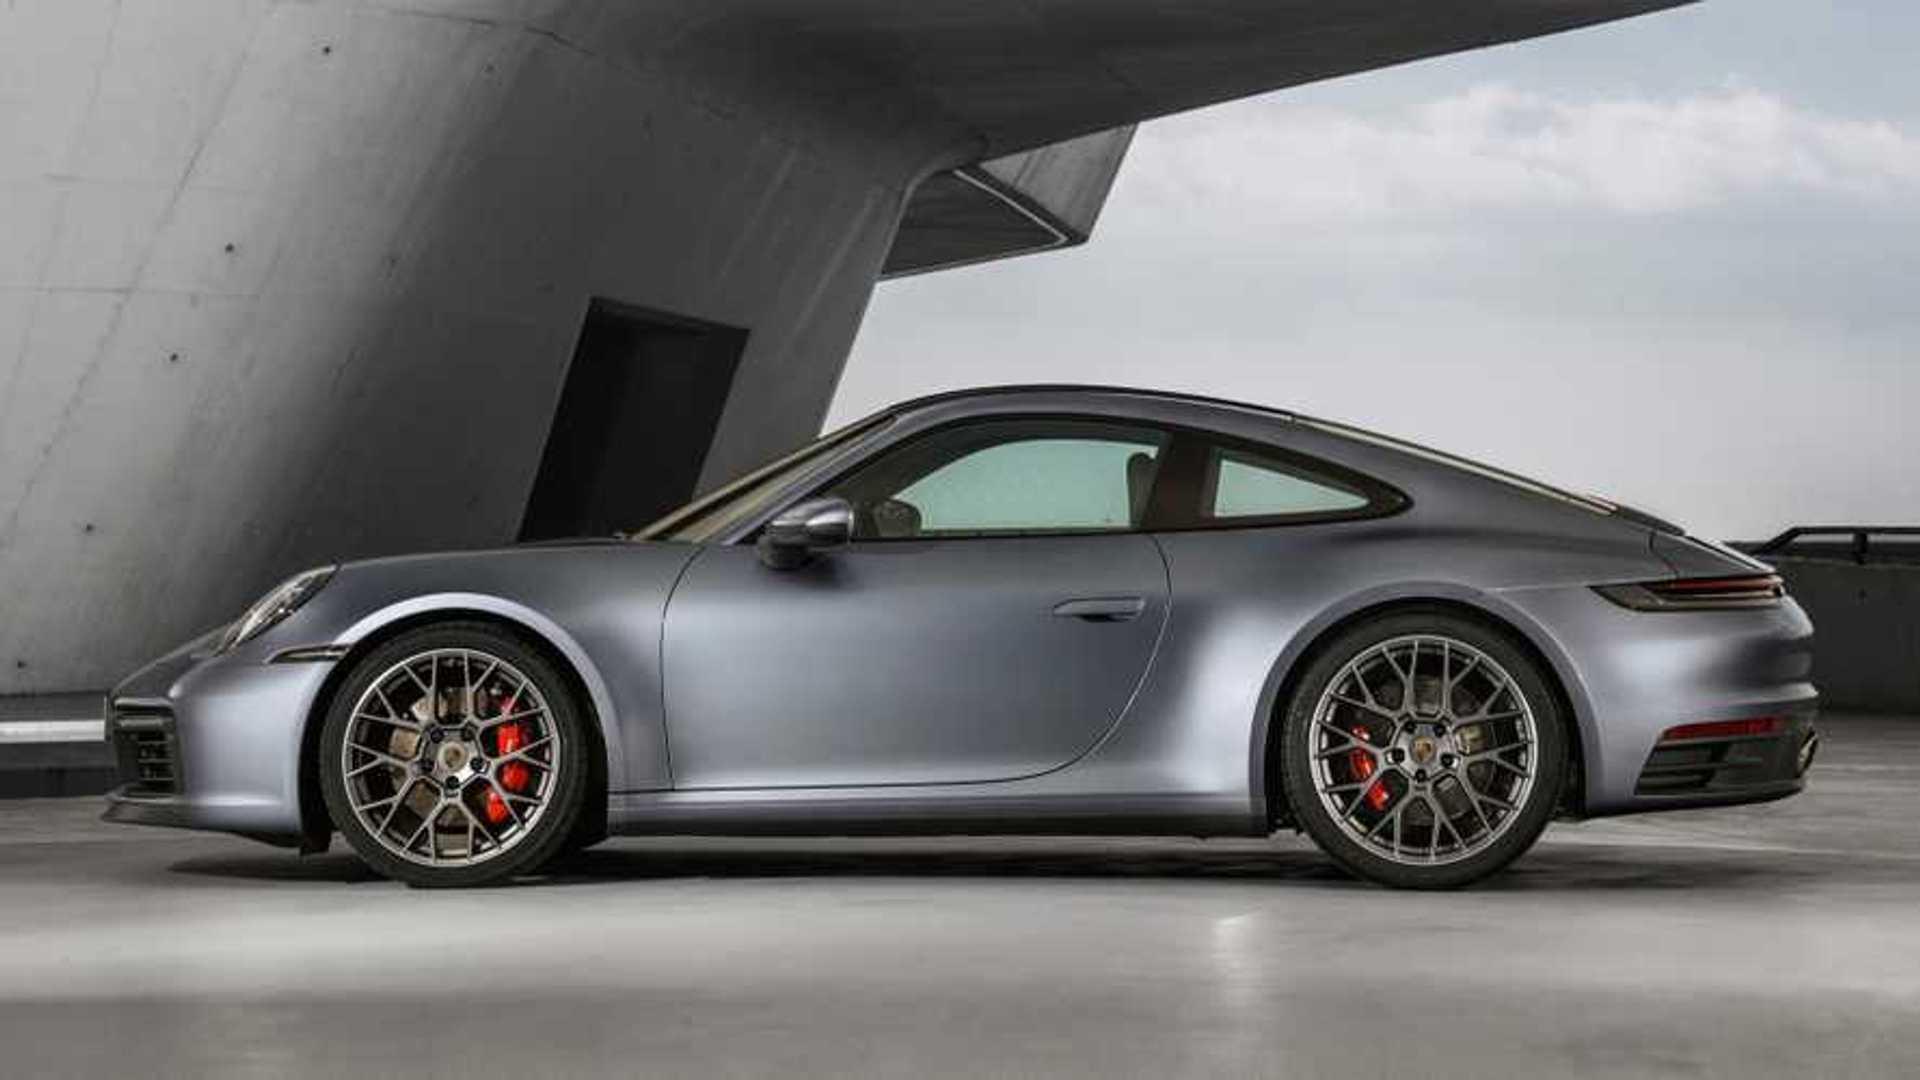 New Porsche 911 >> New Porsche 911 Reaches Top Speed In 6th Gear Not 7th Or 8th